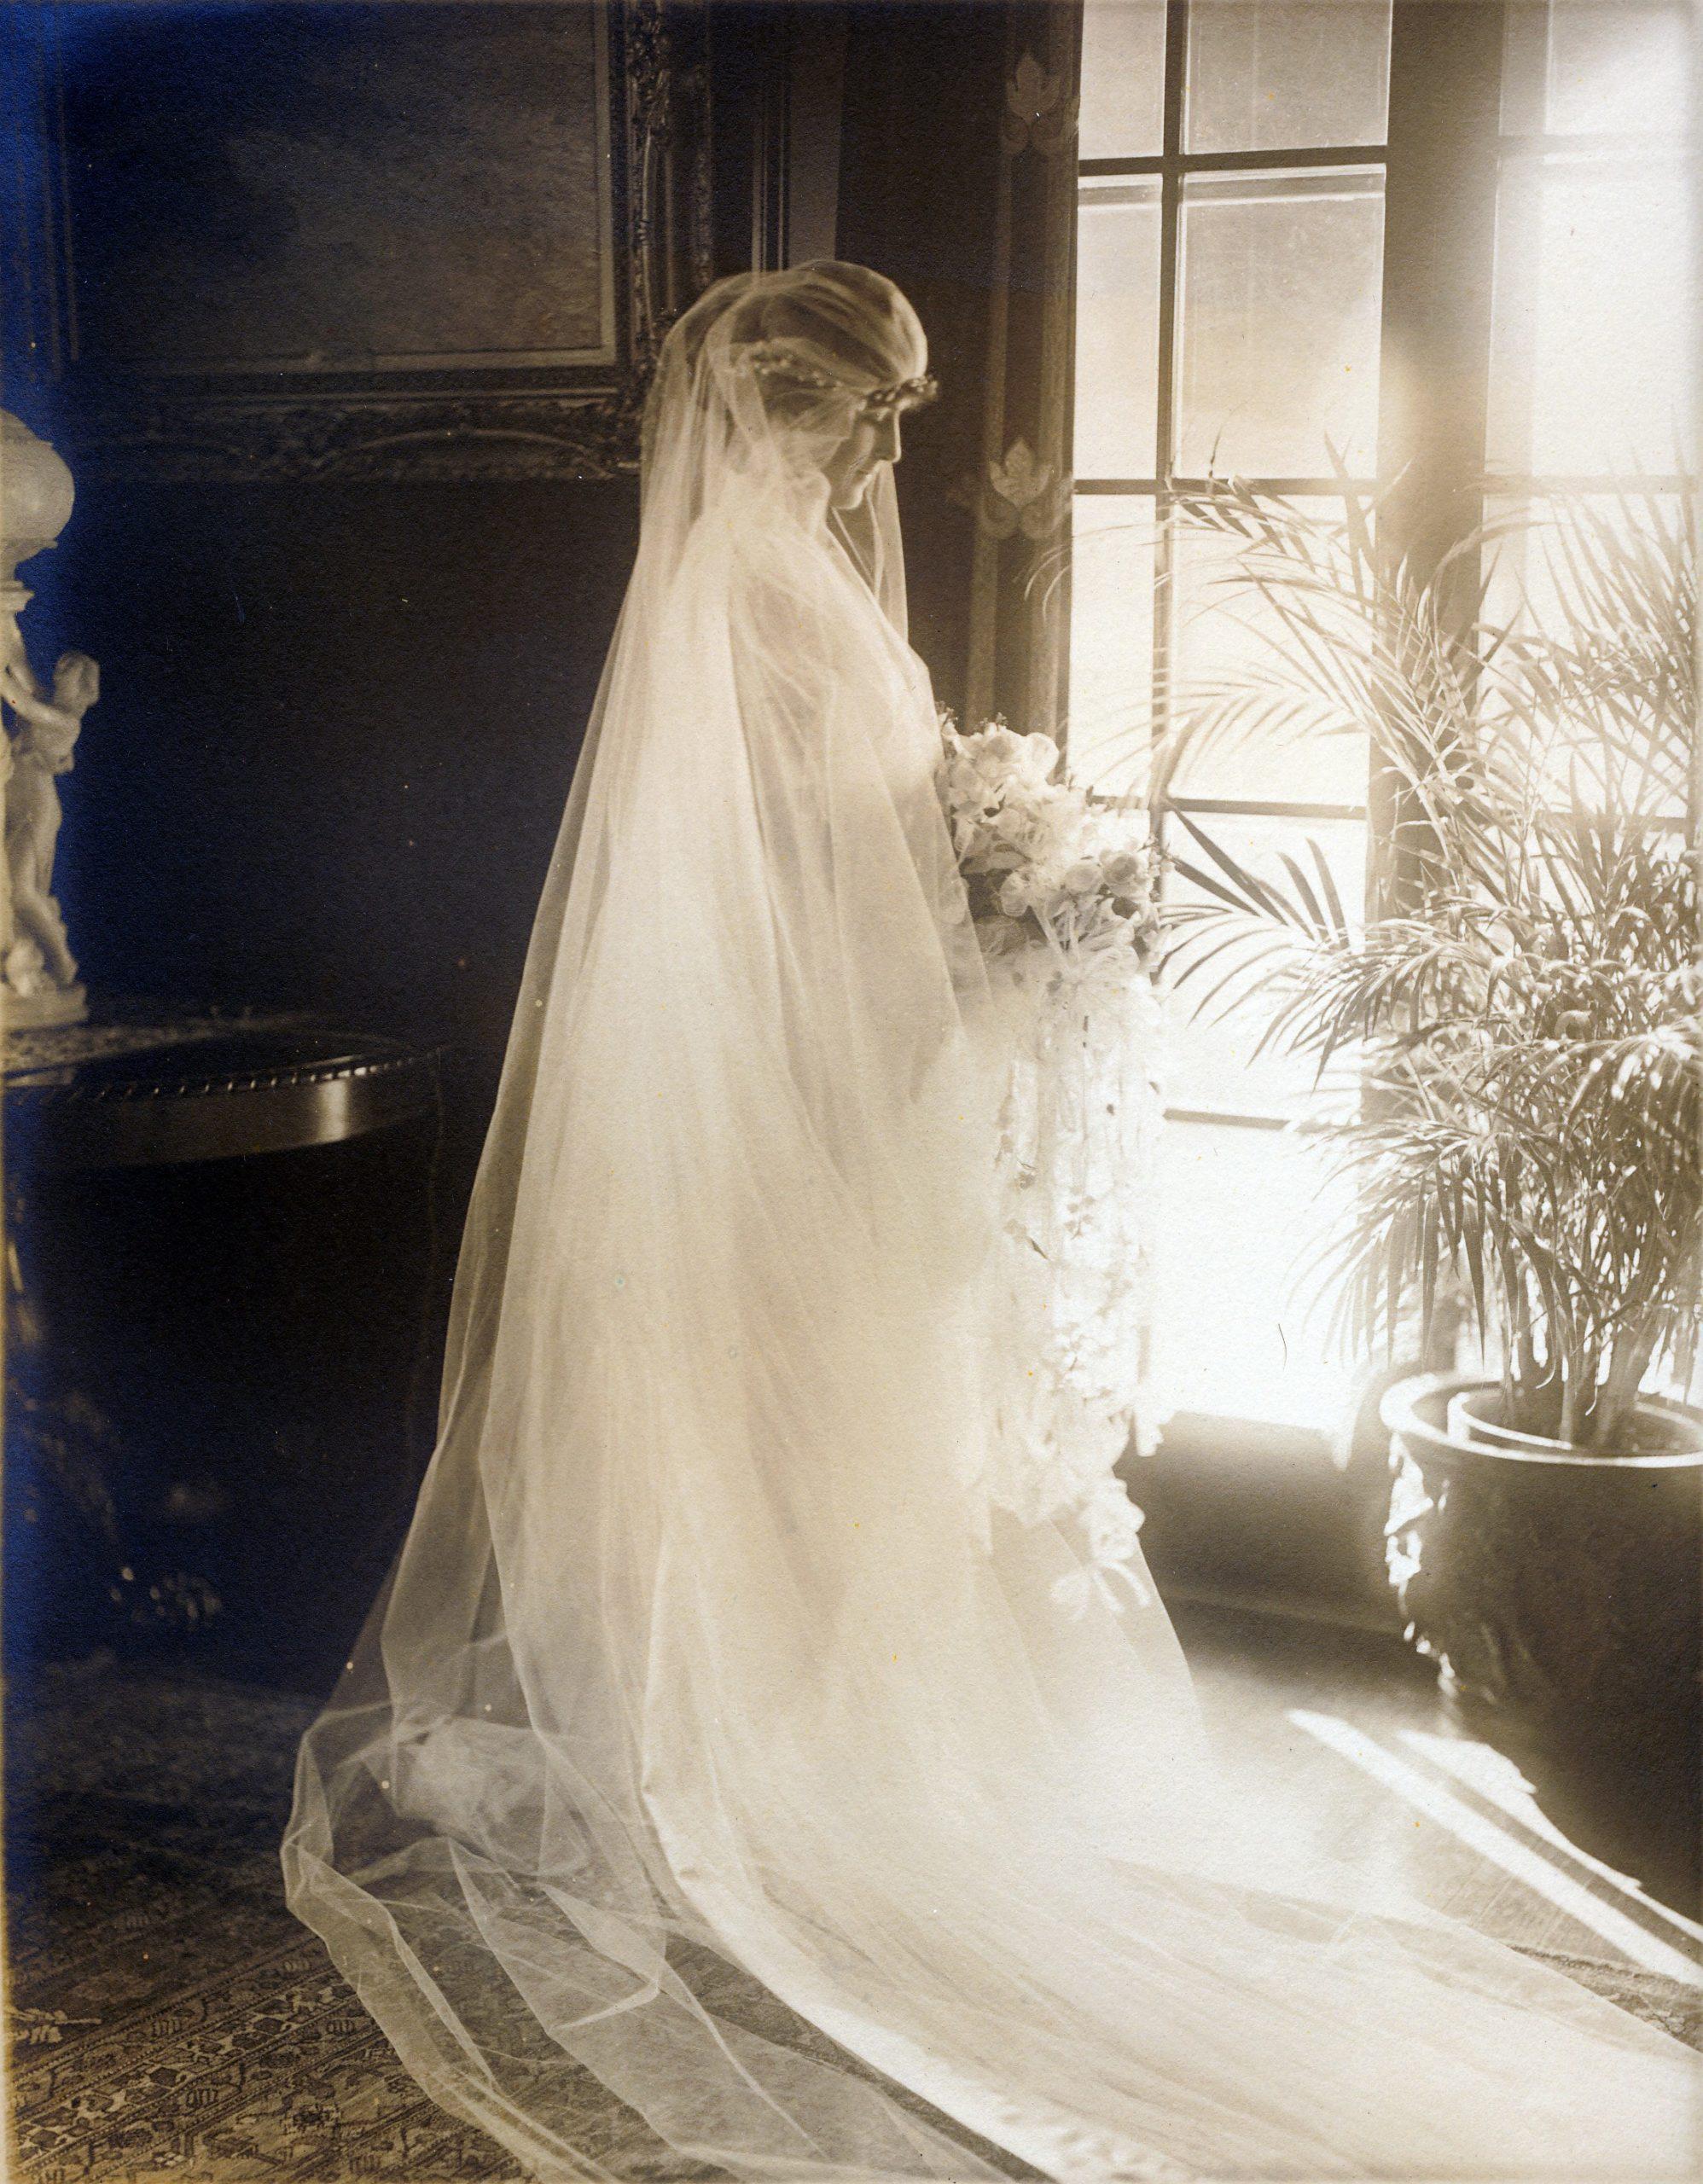 Helen Congdon looks out a window as her wedding dress train flirts across the floor.